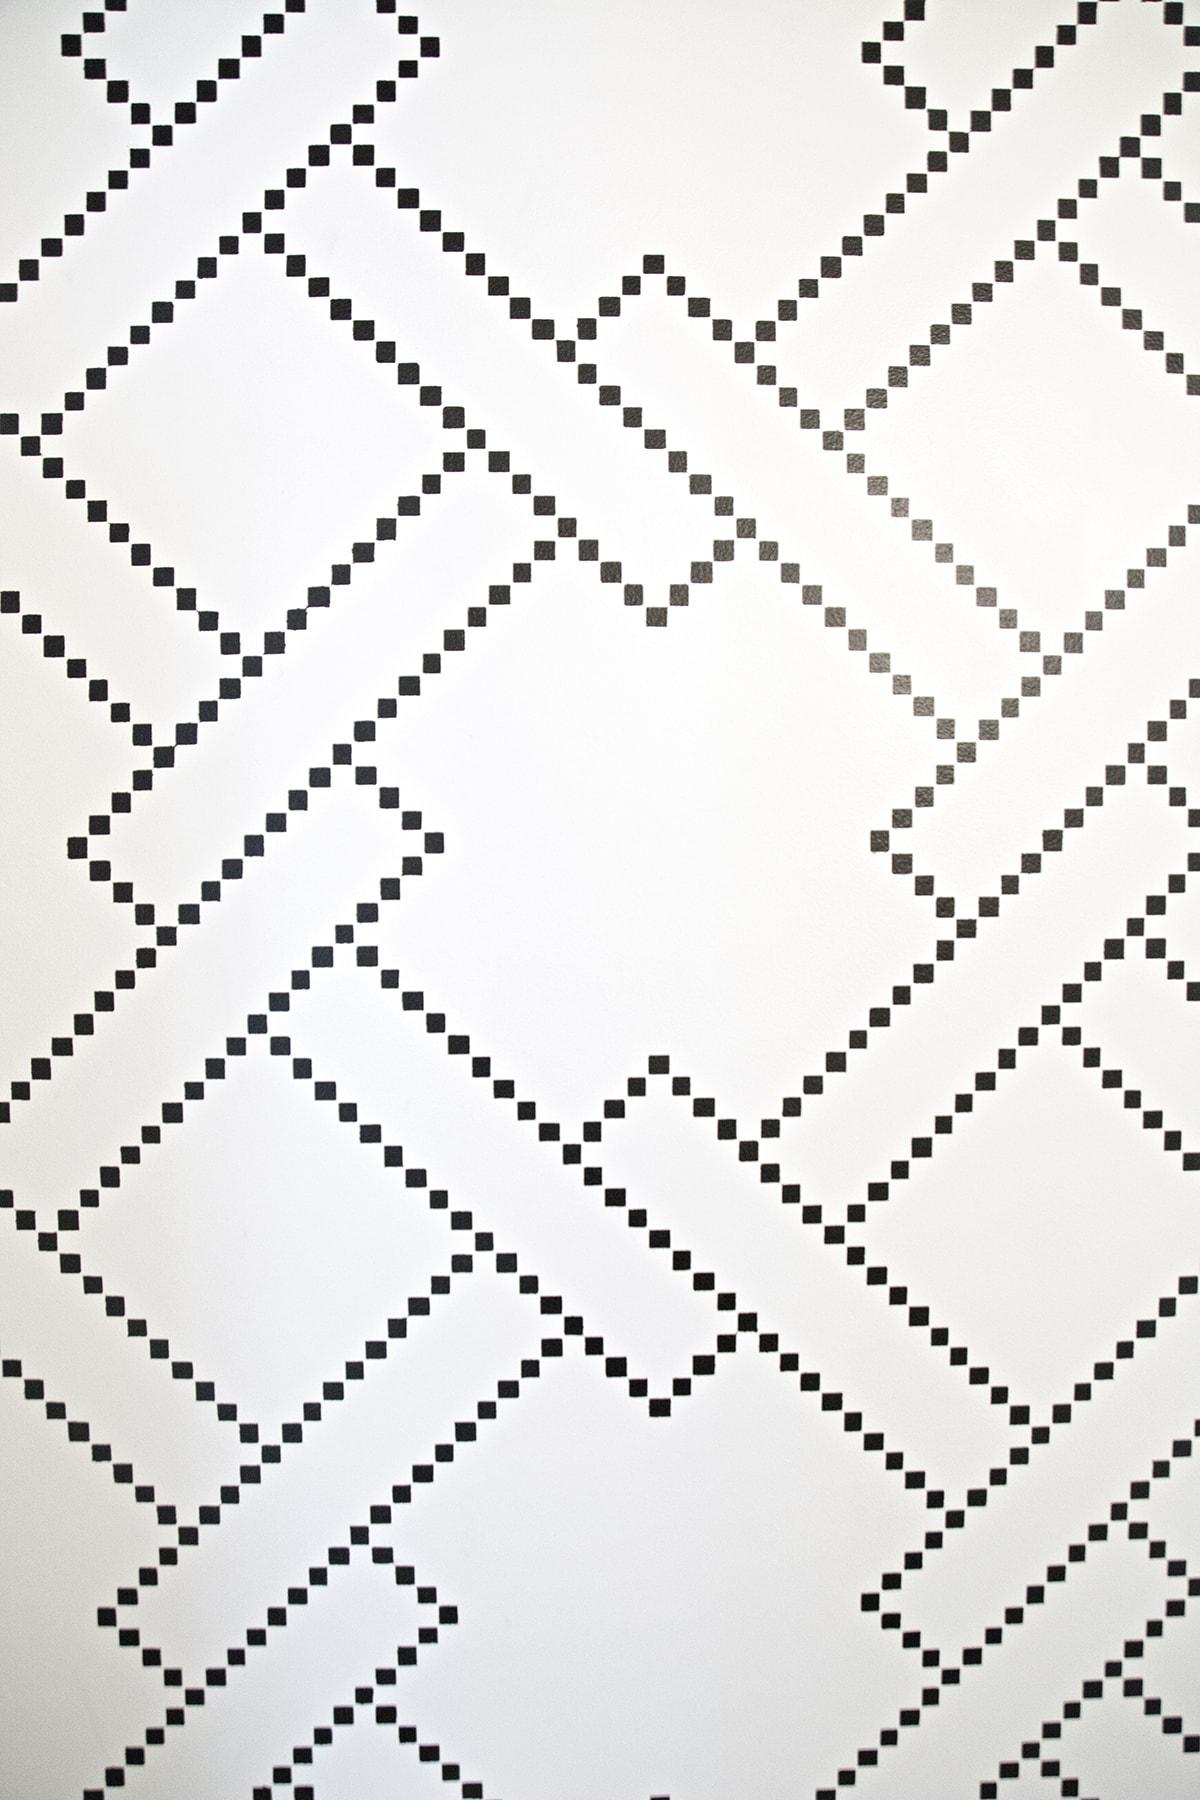 black and white tile mosaic stencil